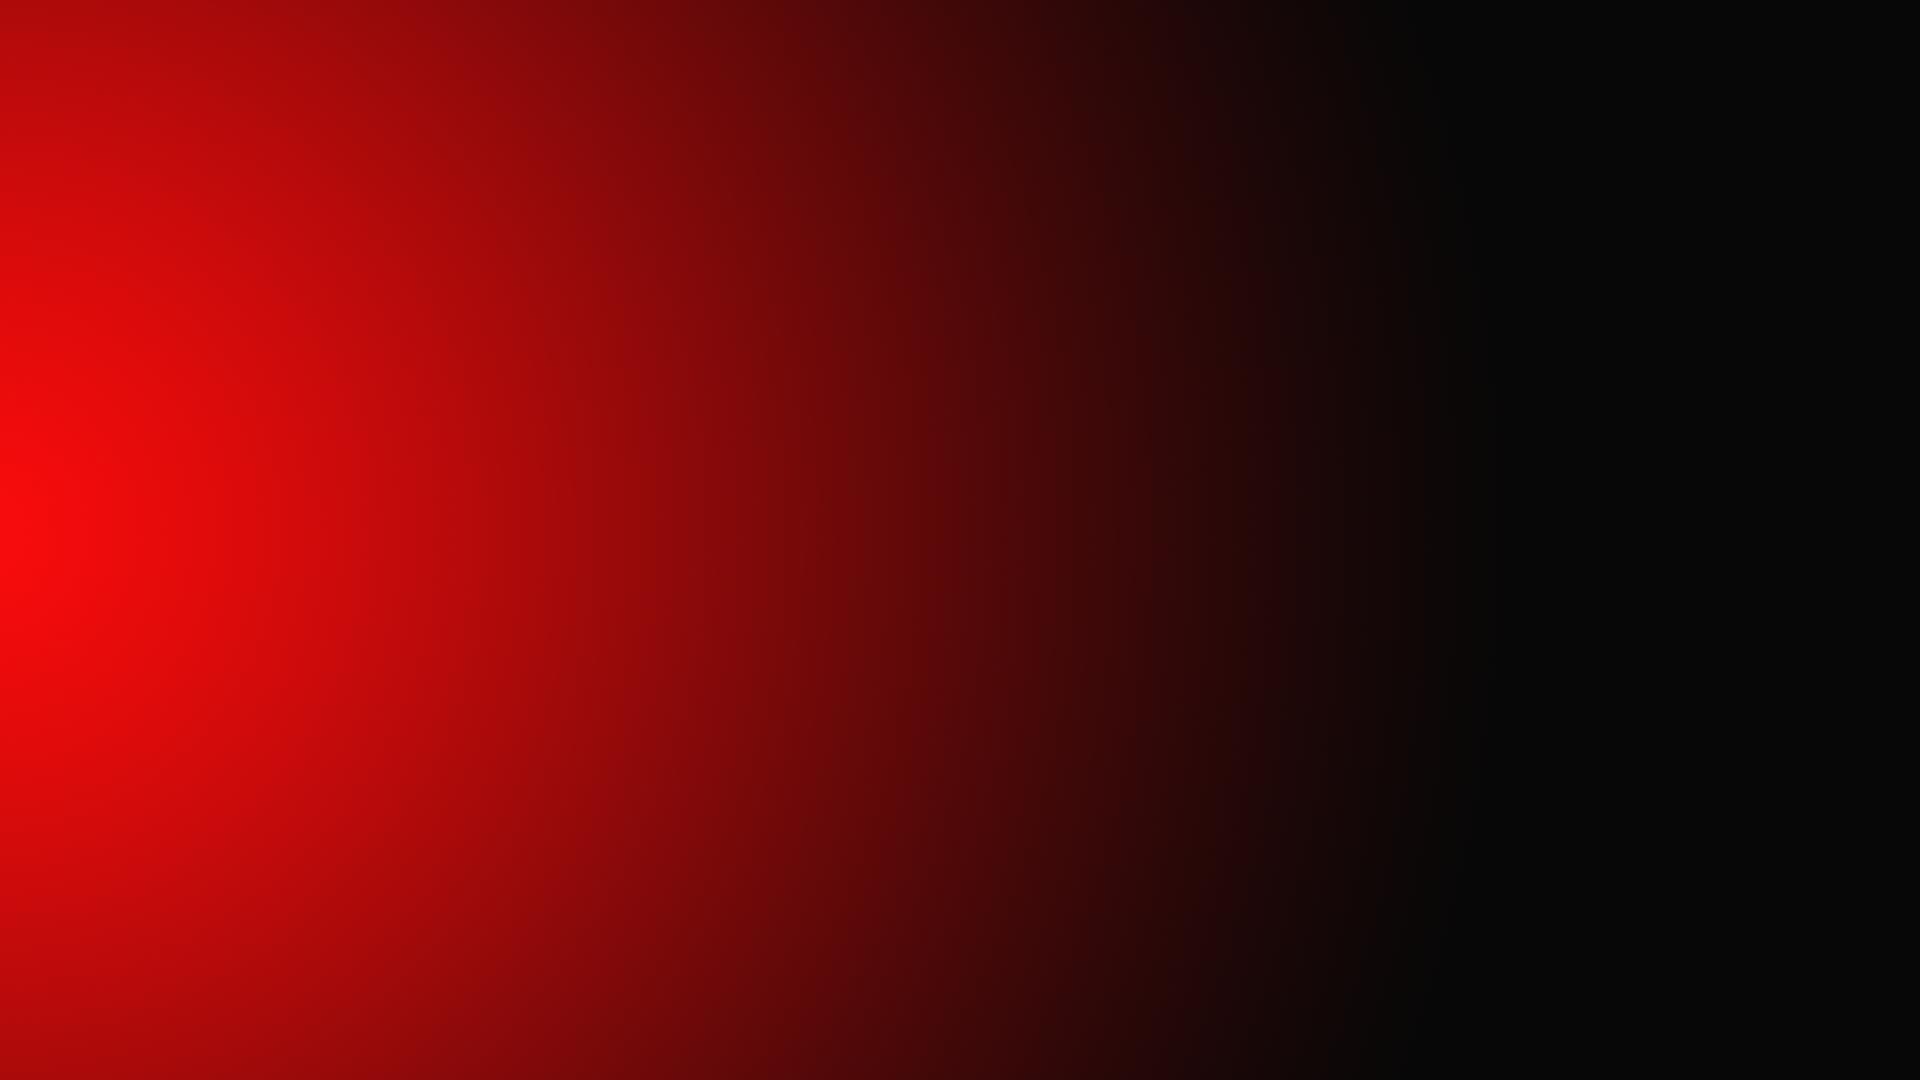 Red Black HD wallpaper download Wallpaper ponsel